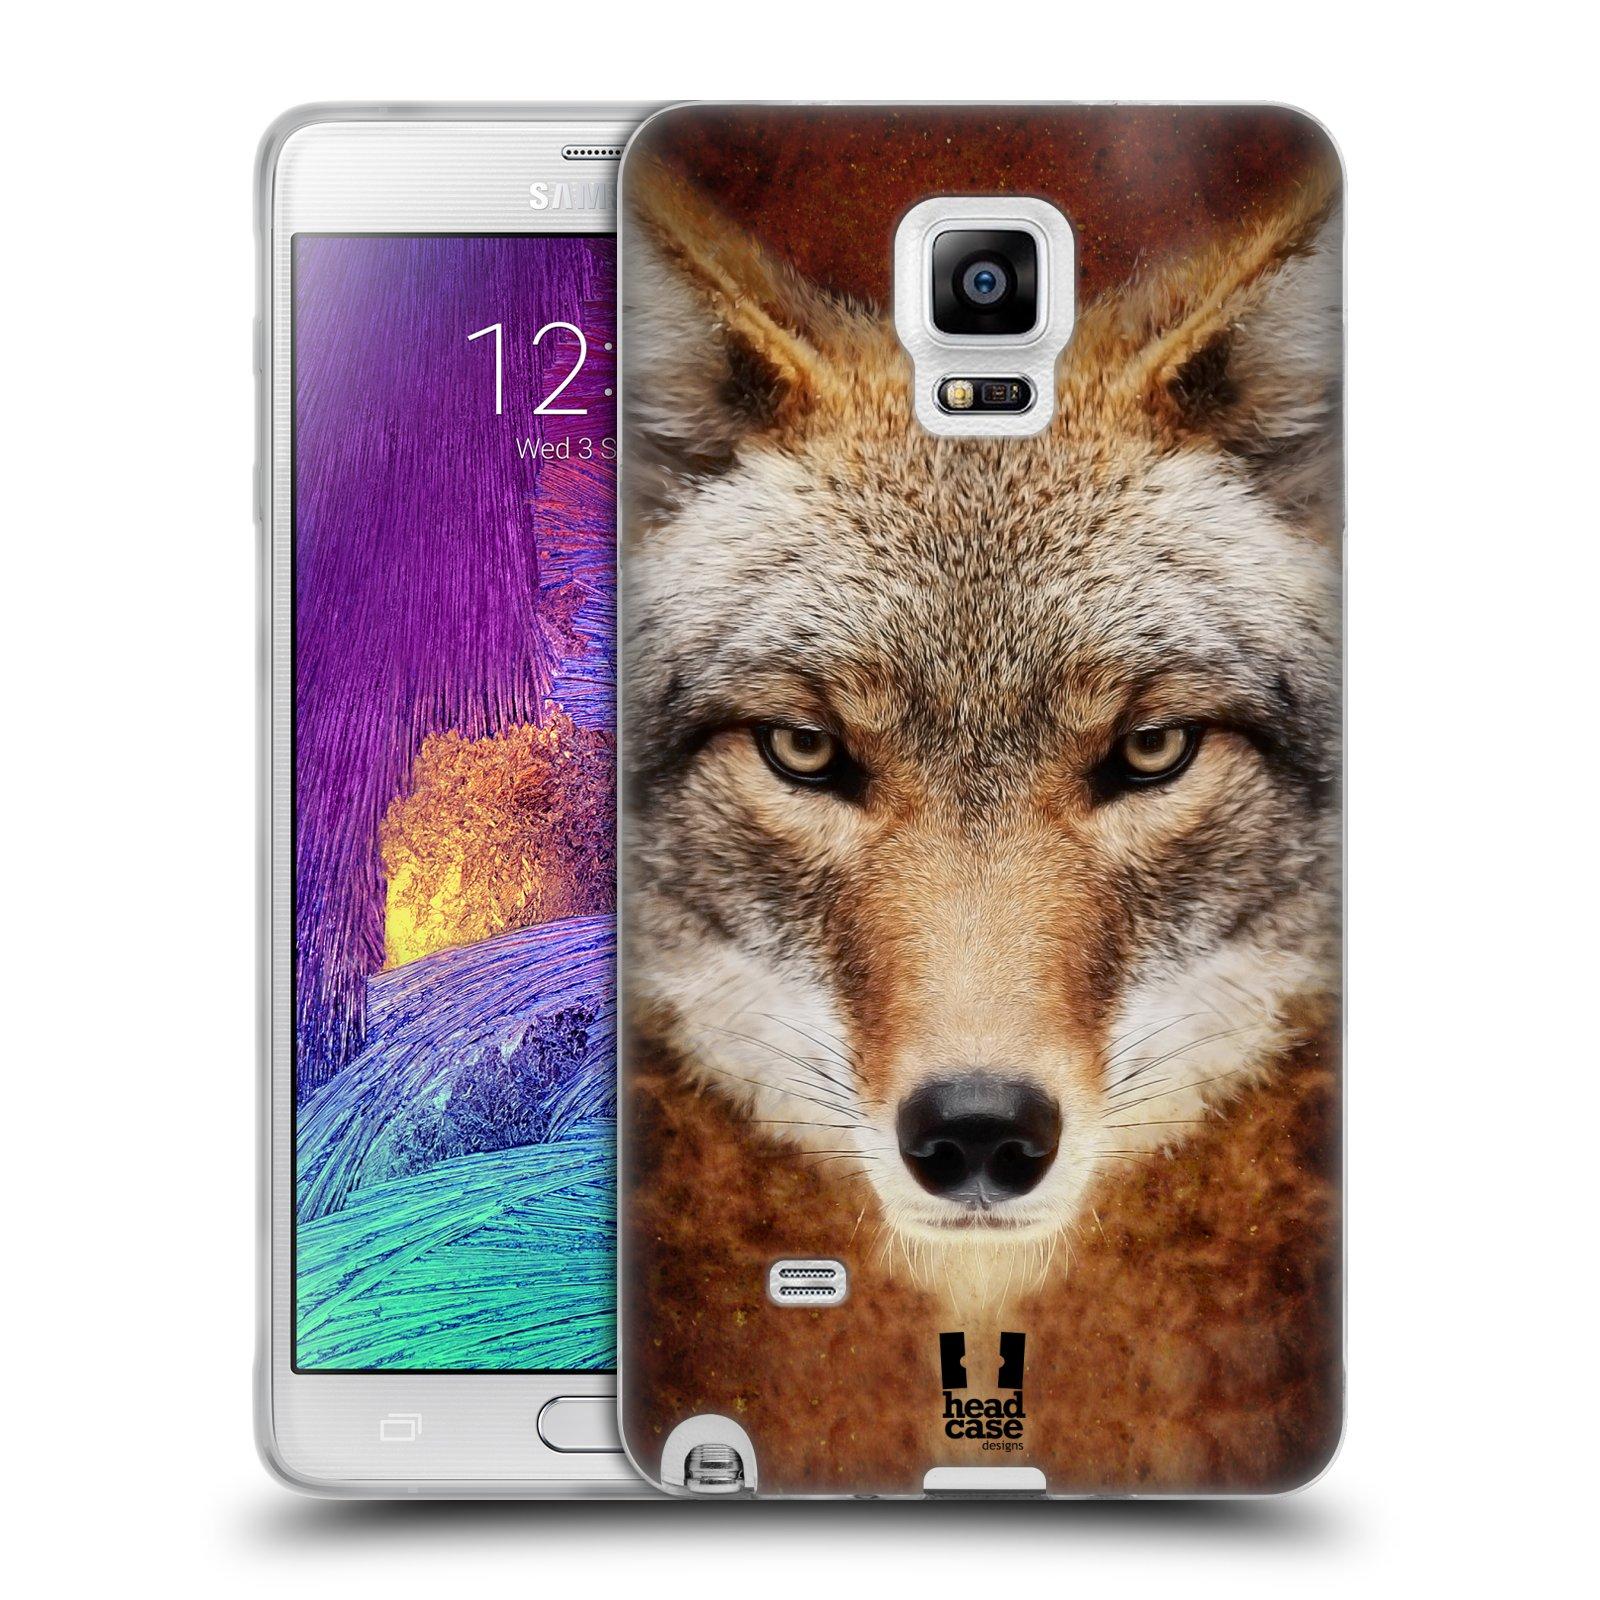 HEAD CASE silikonový obal na mobil Samsung Galaxy Note 4 (N910) vzor Zvířecí tváře kojot